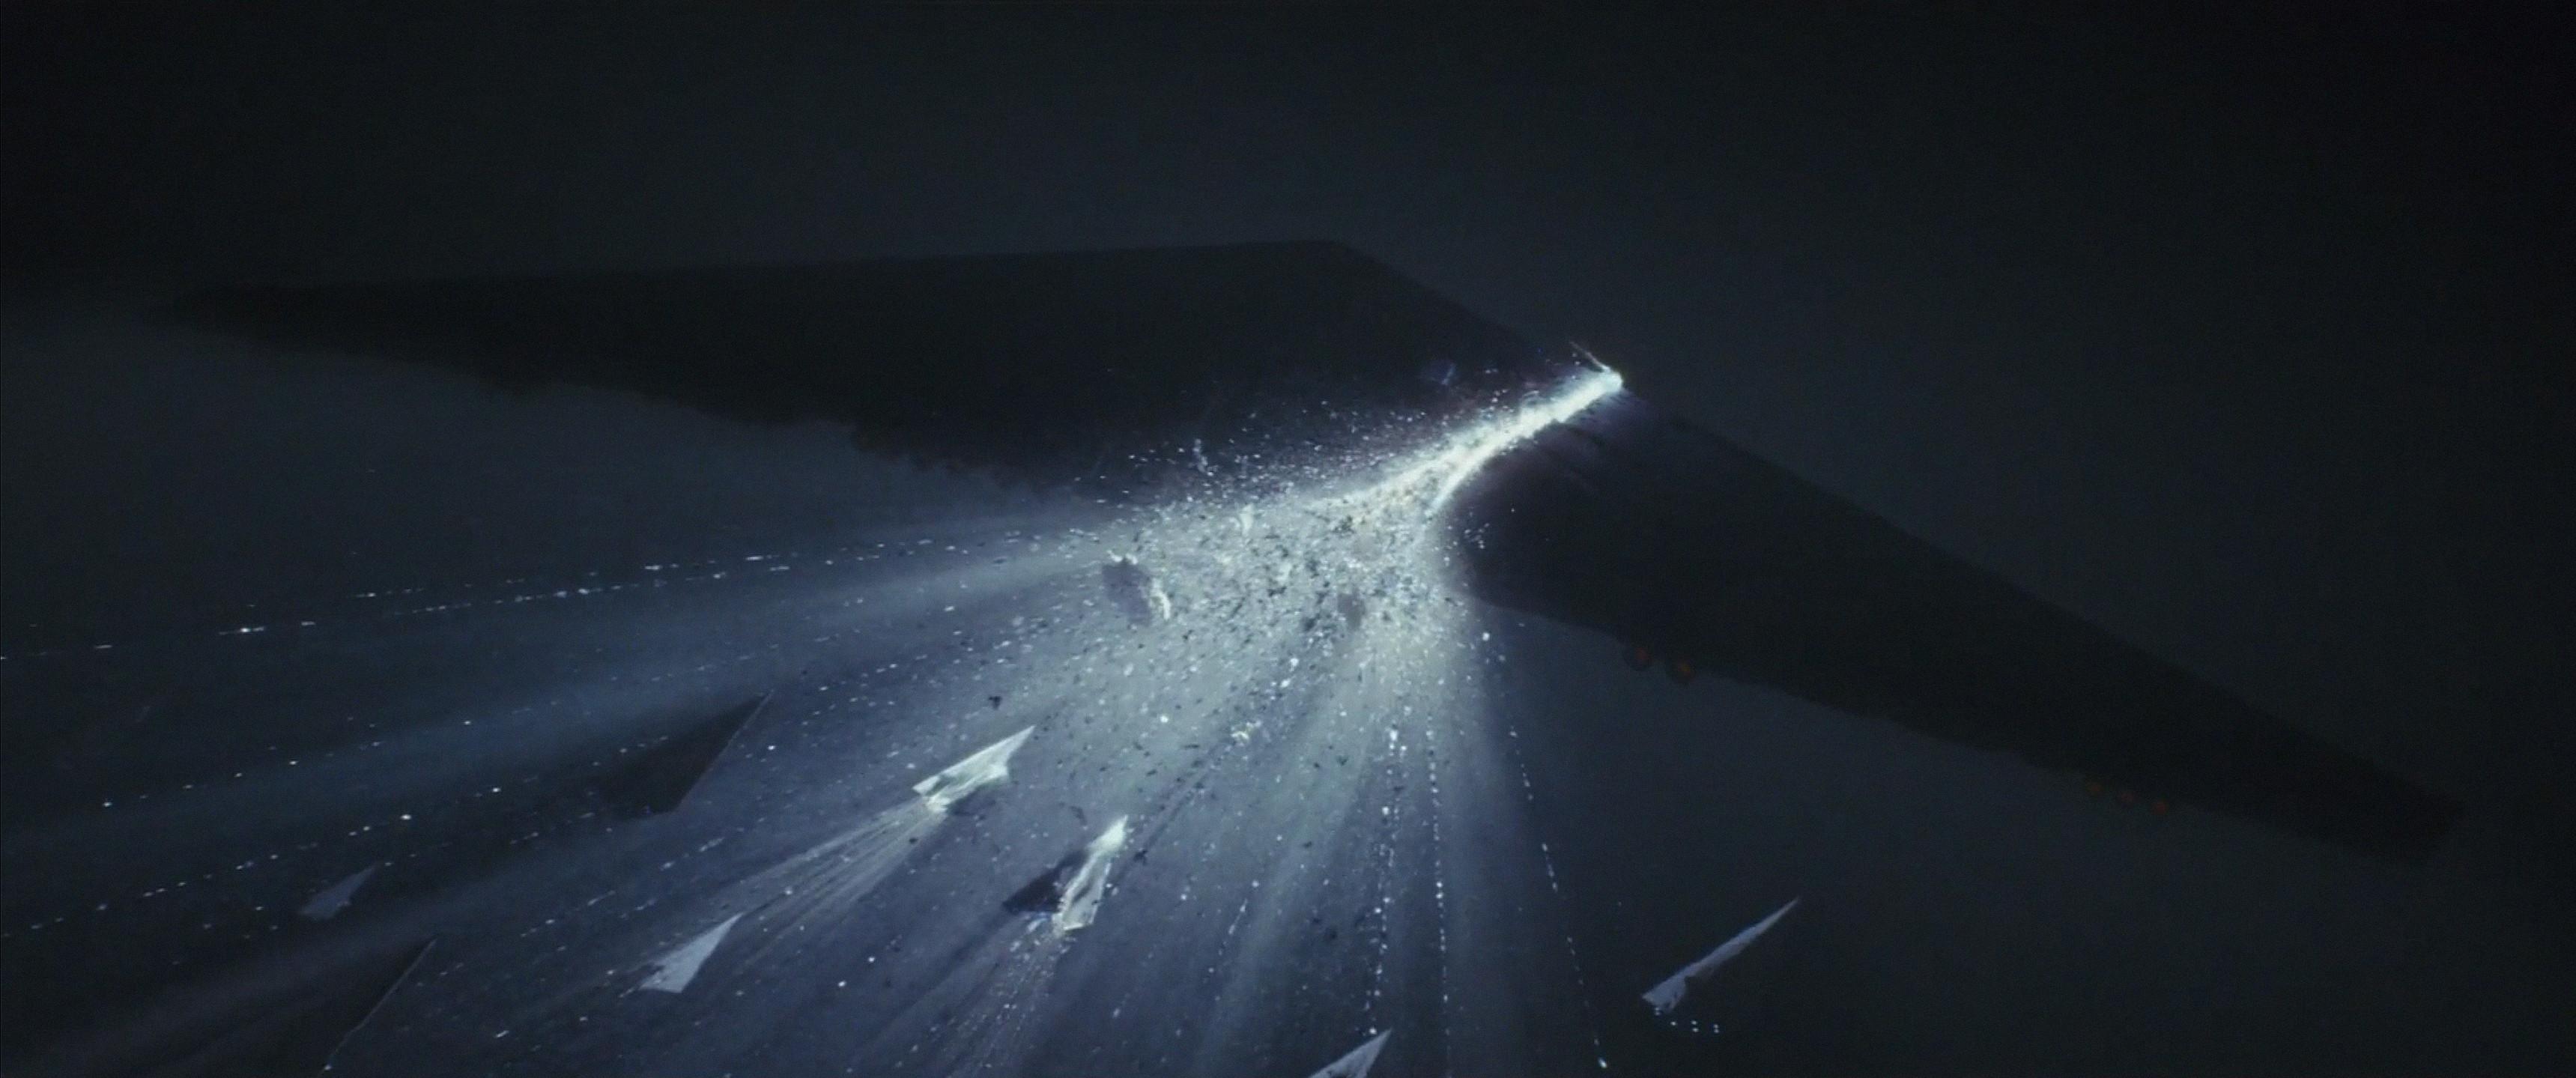 Stardestroyers - Slicing, Damage, debrish